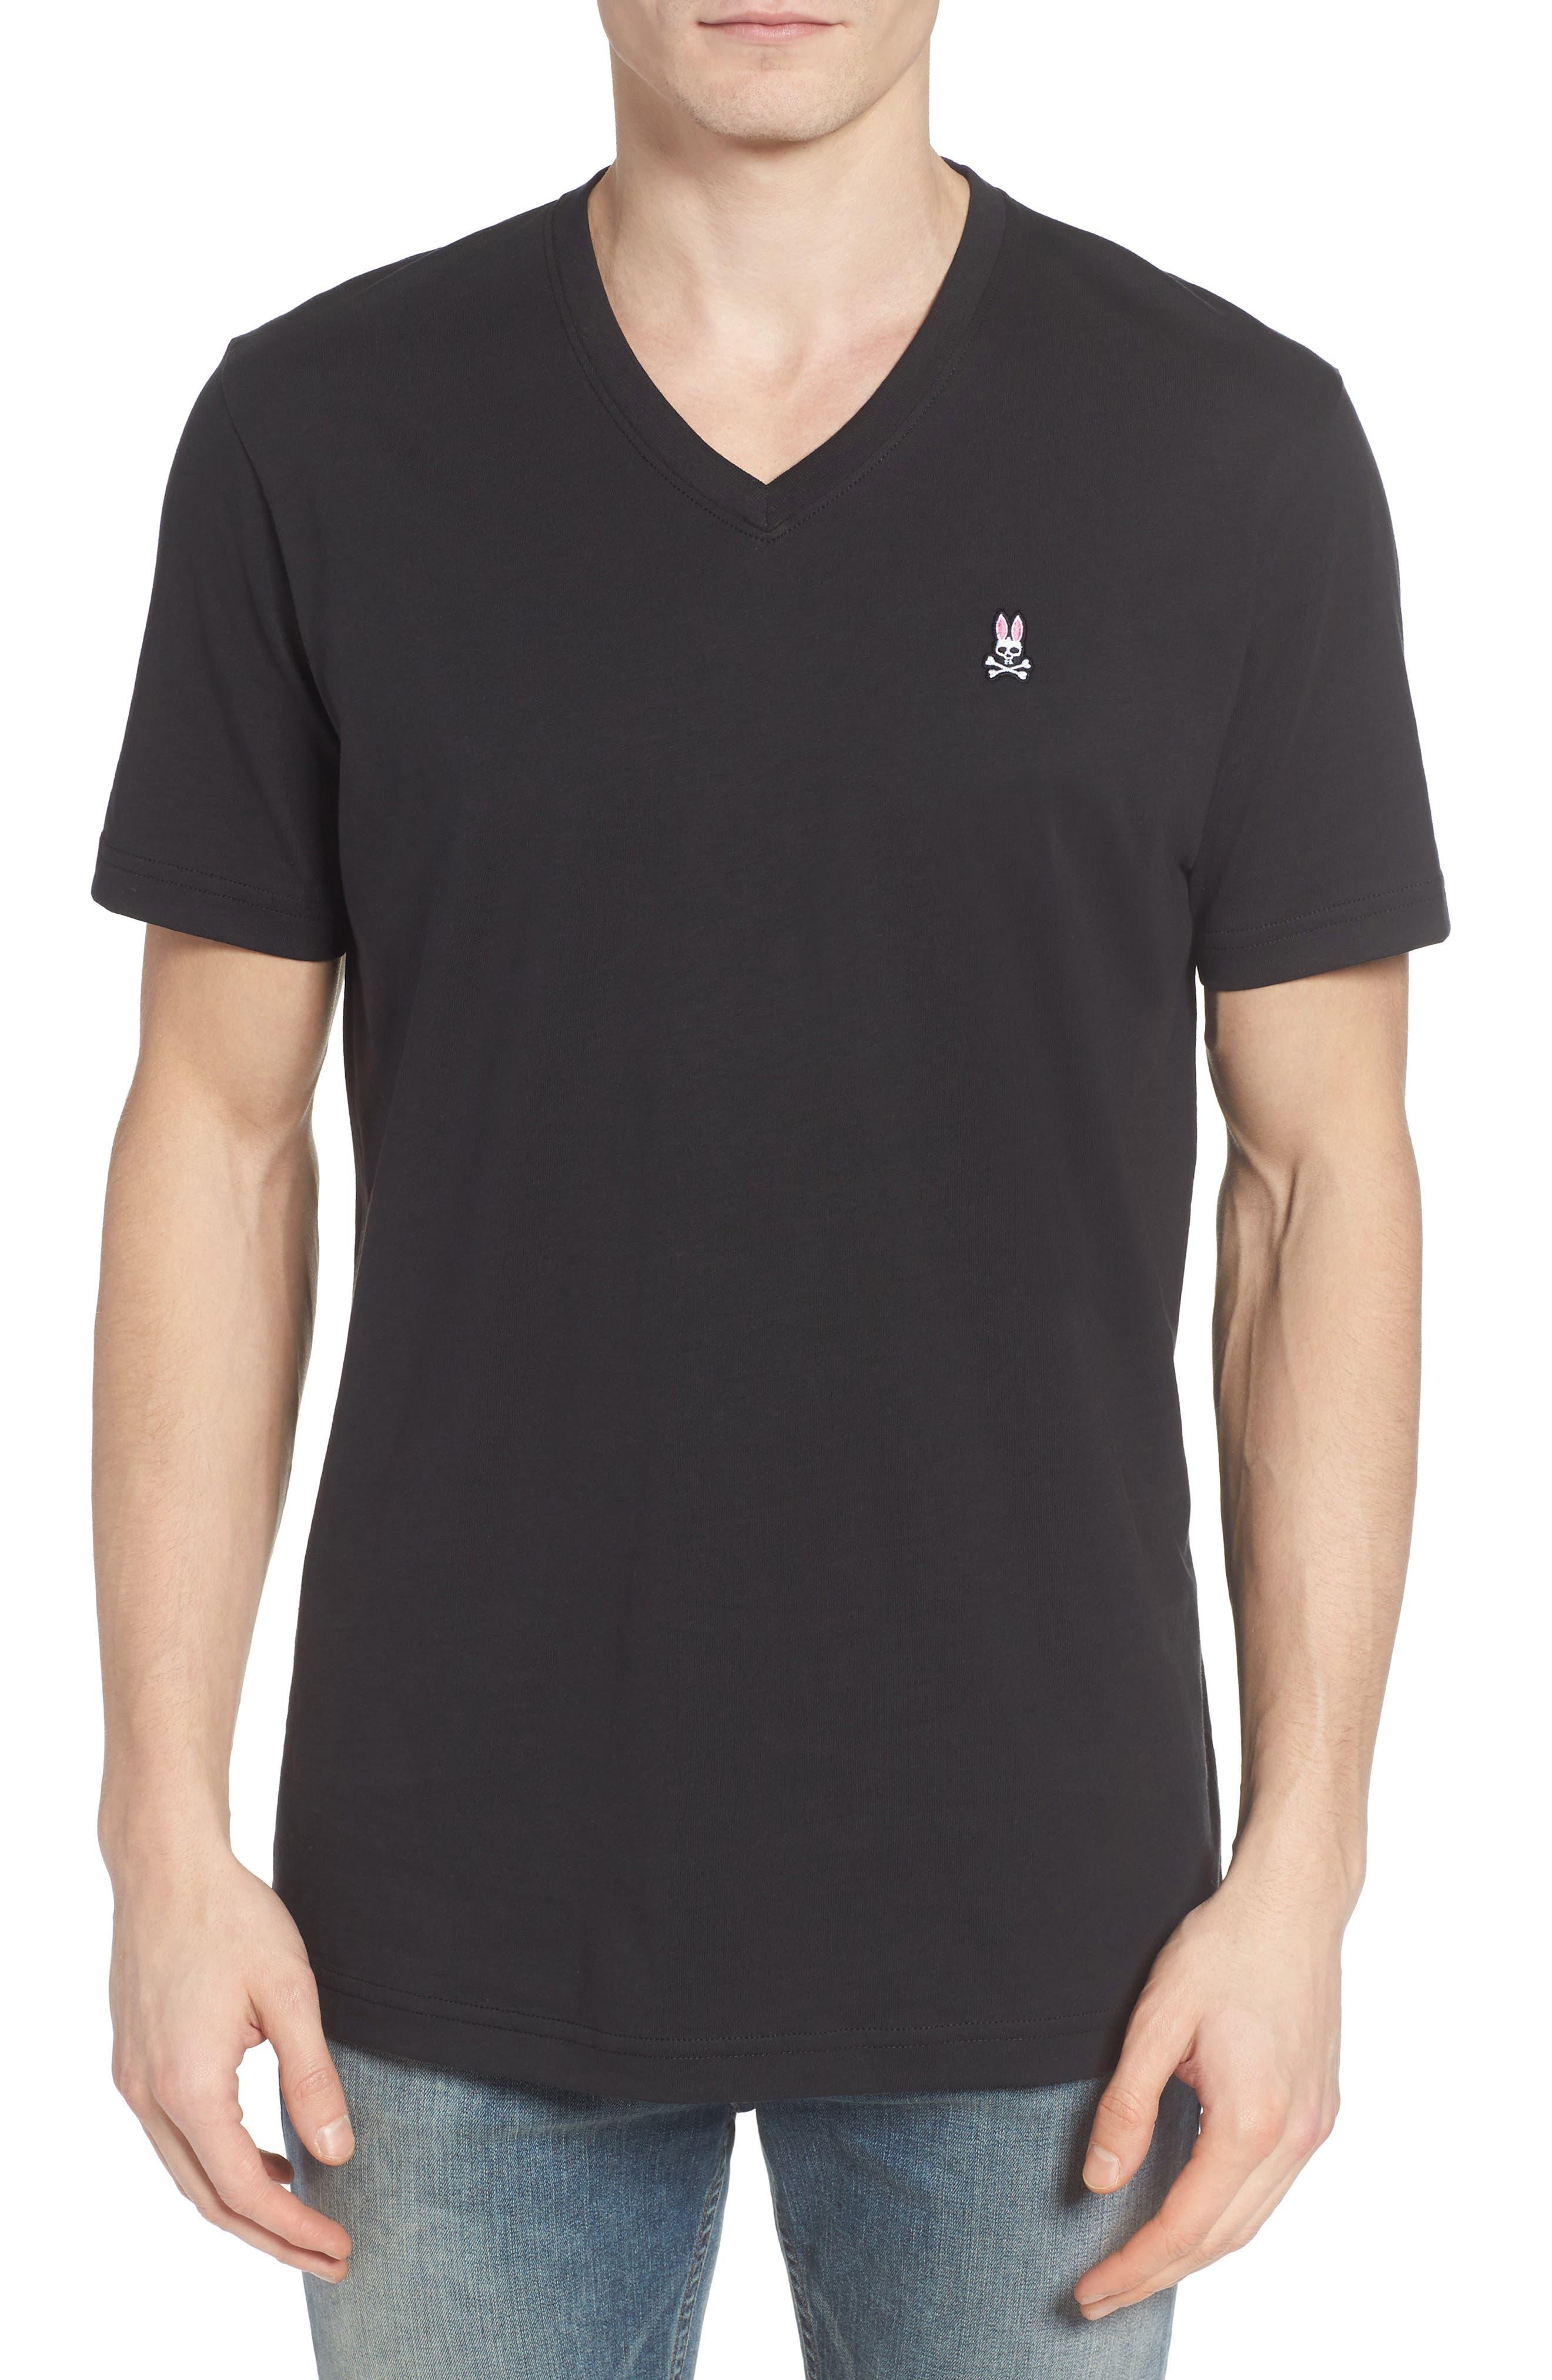 PSYCHO BUNNY, V-Neck T-Shirt, Main thumbnail 1, color, BLACK